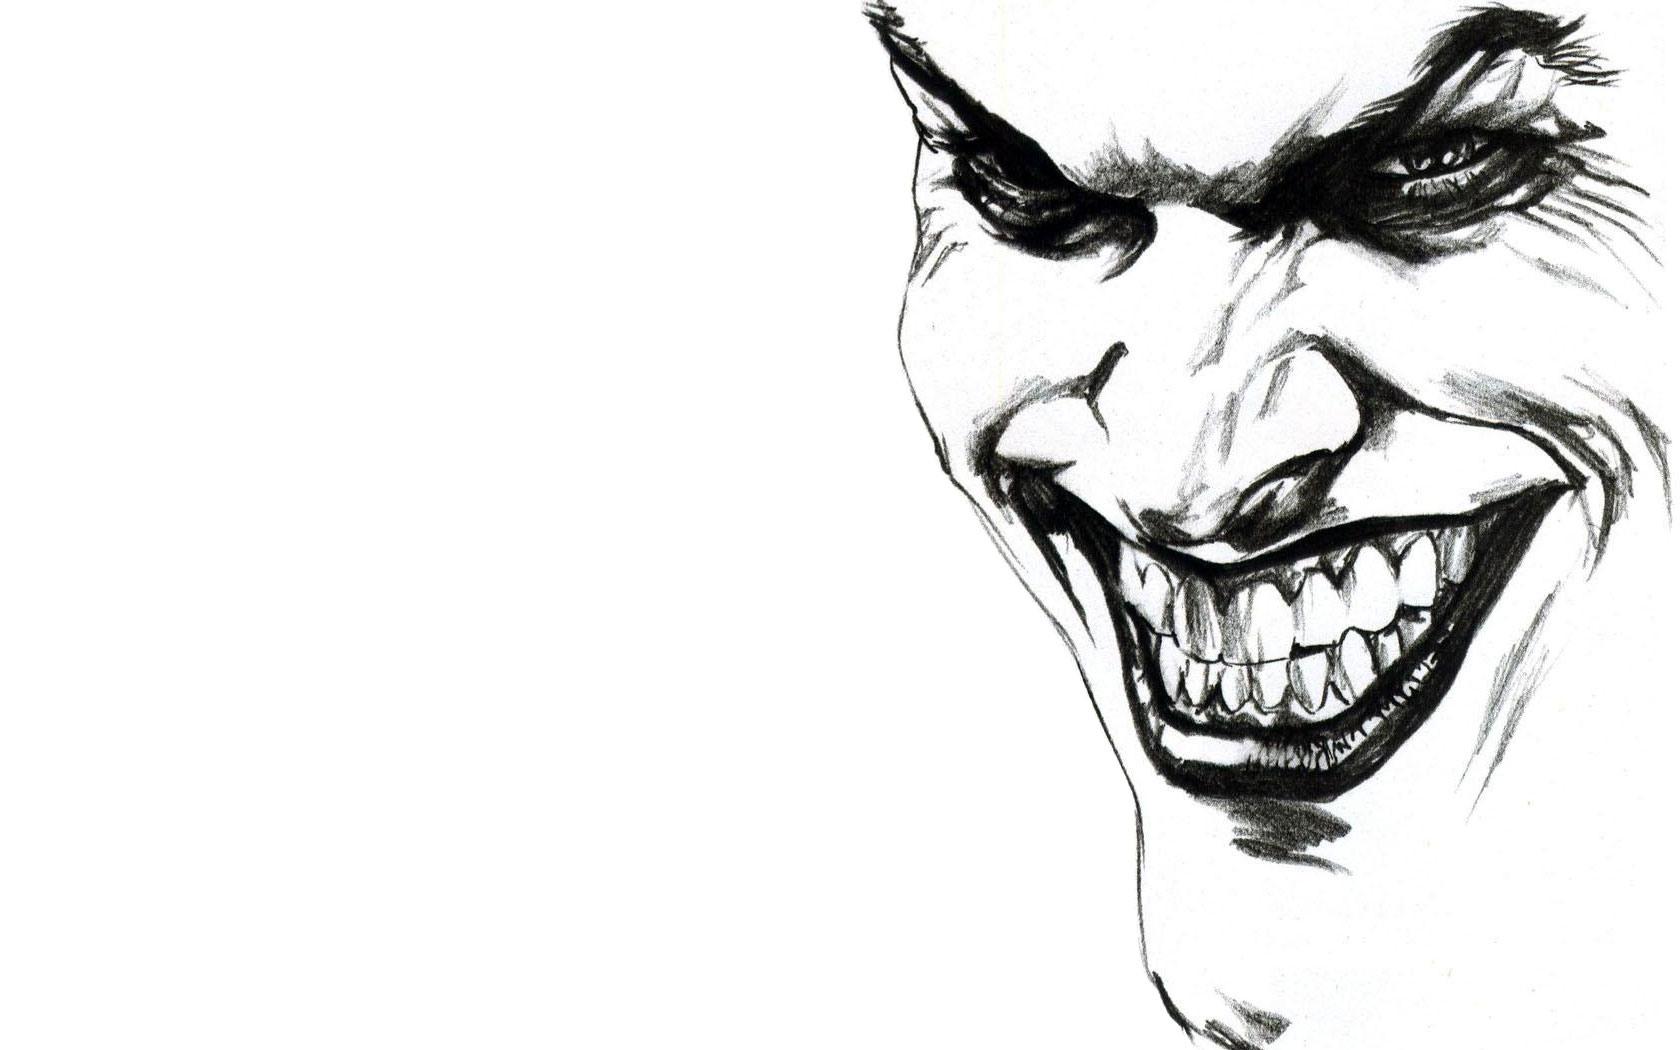 Batman wallpaper and background 1680x1050 id 80331 for Immagini joker hd